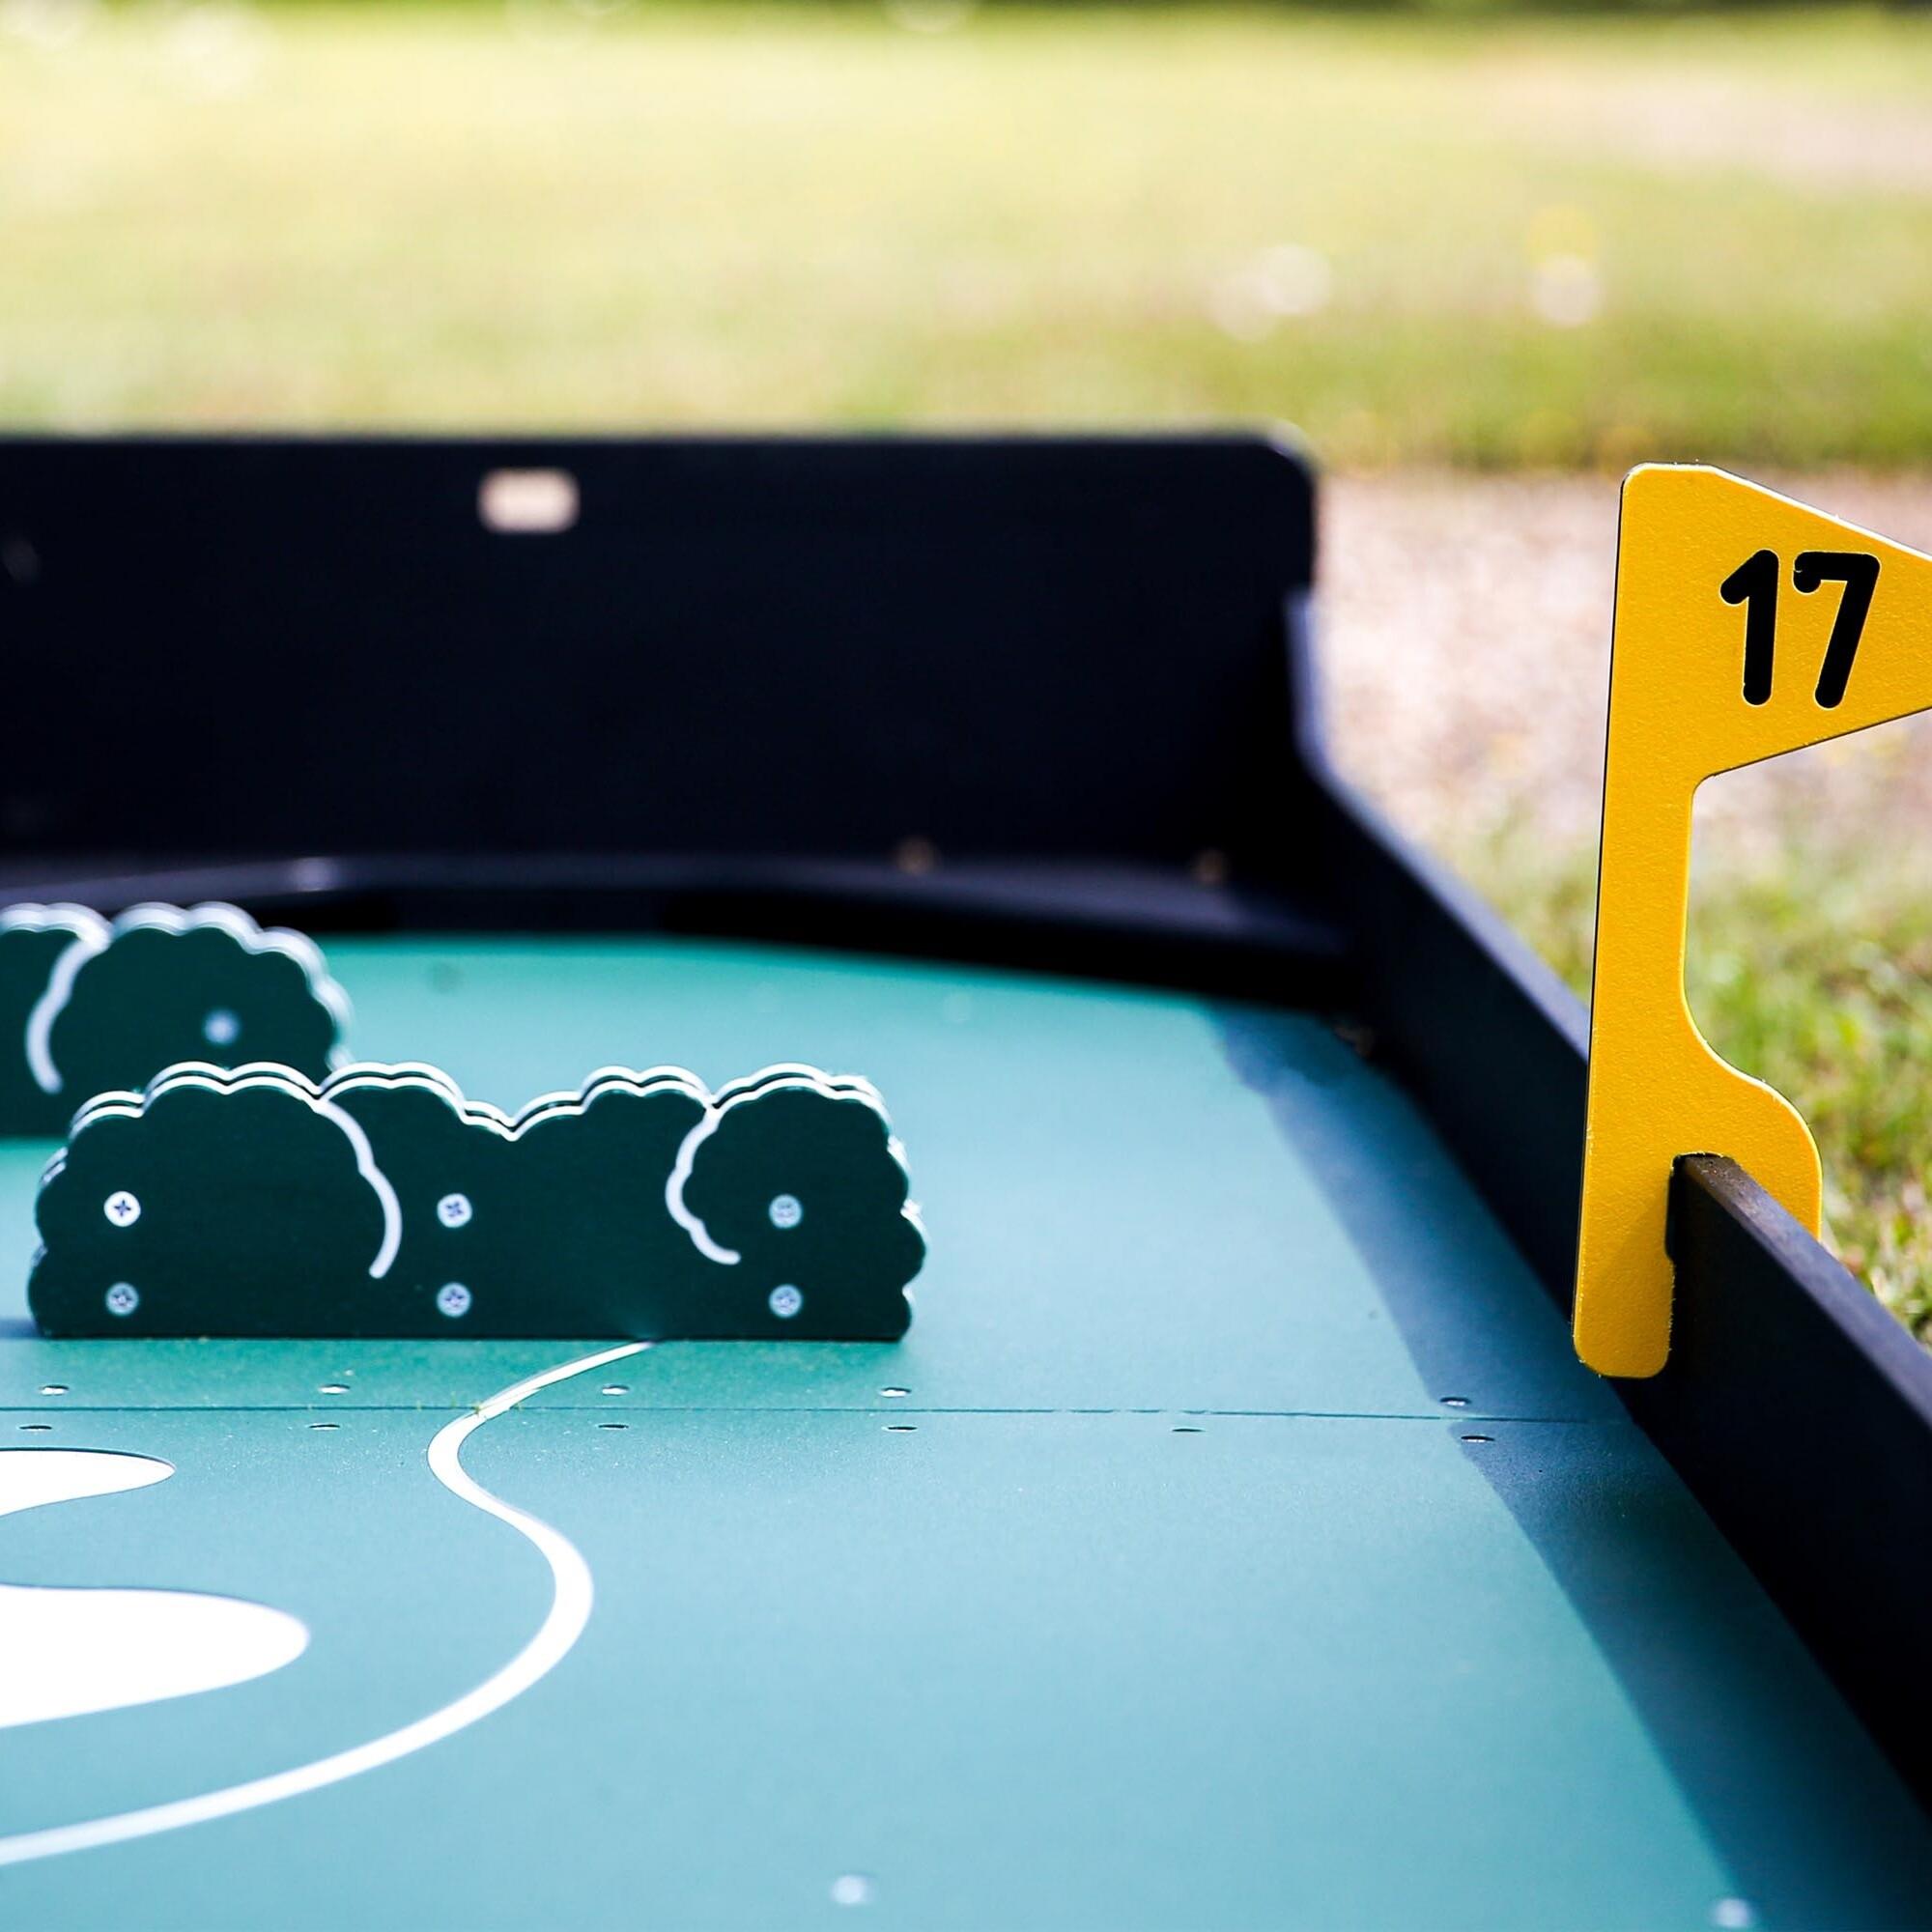 Crazy Golf Hire Hole 17 Fetcham